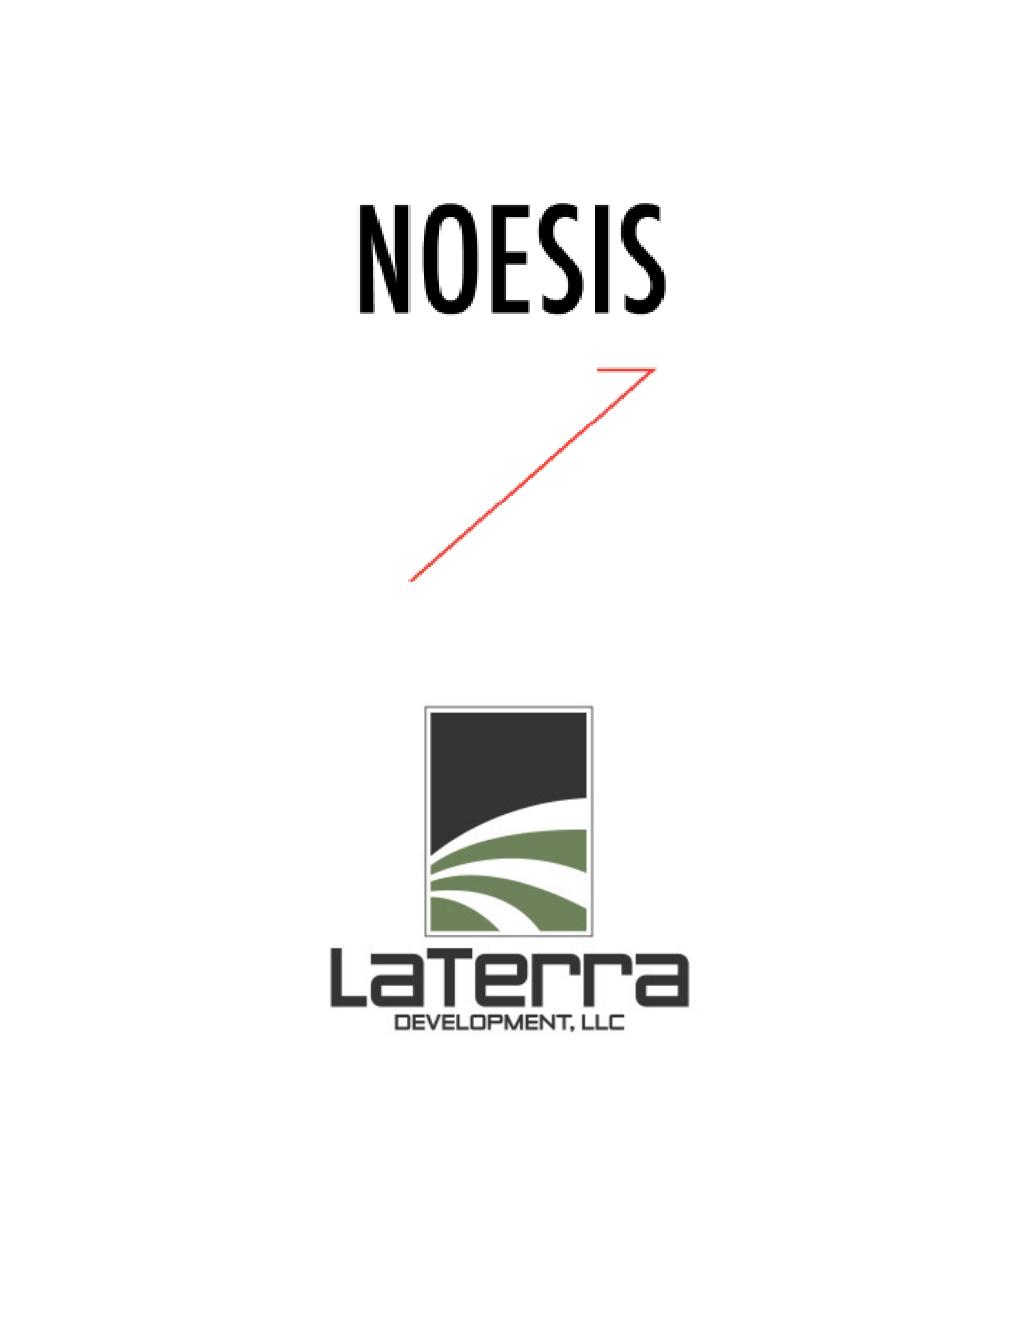 Client Logos 8.png